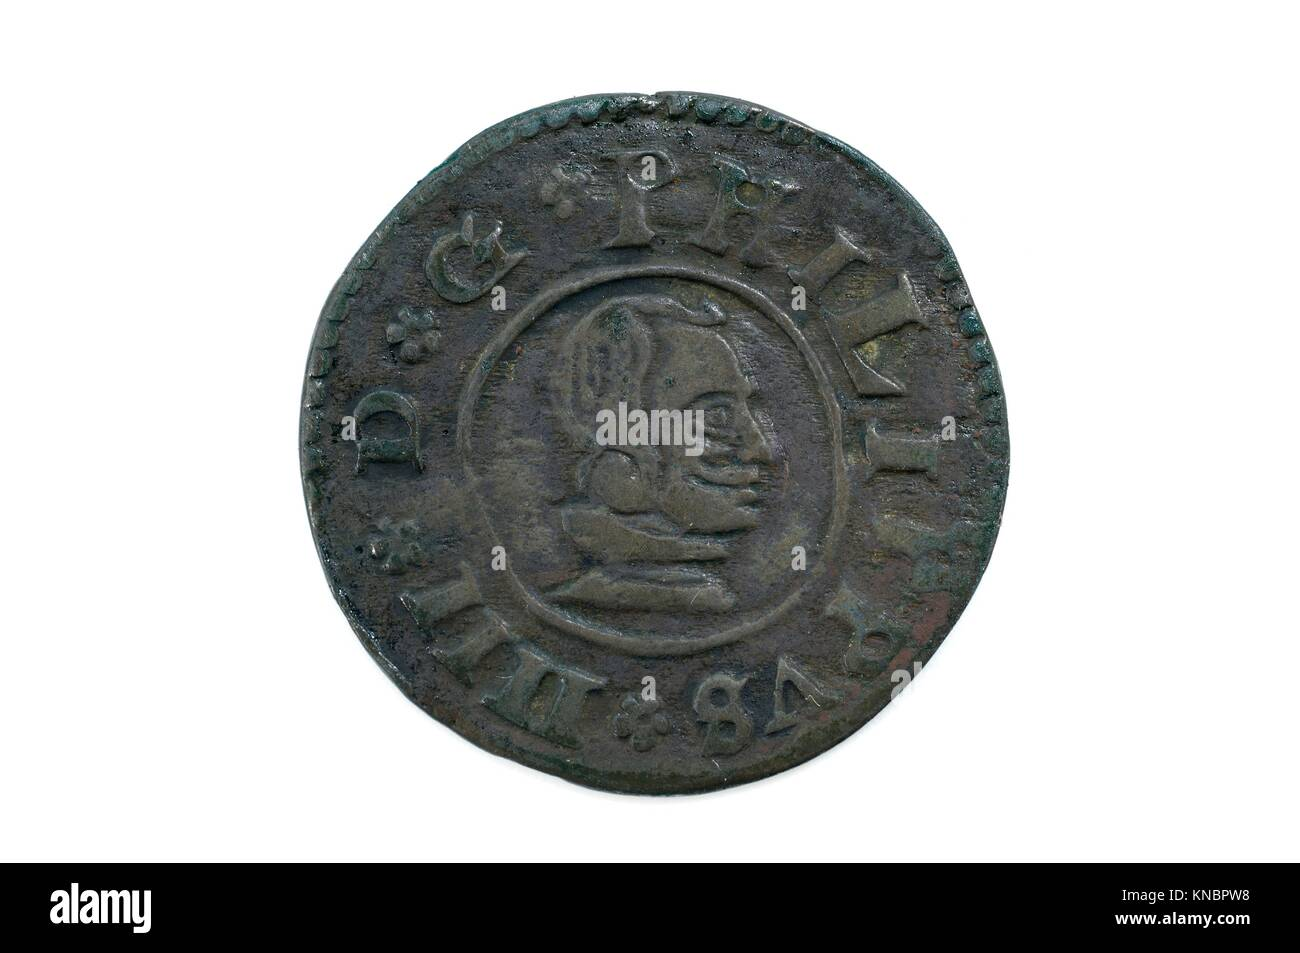 Felipe IV, 1663, 16 Maravedis, spain coin. - Stock Image